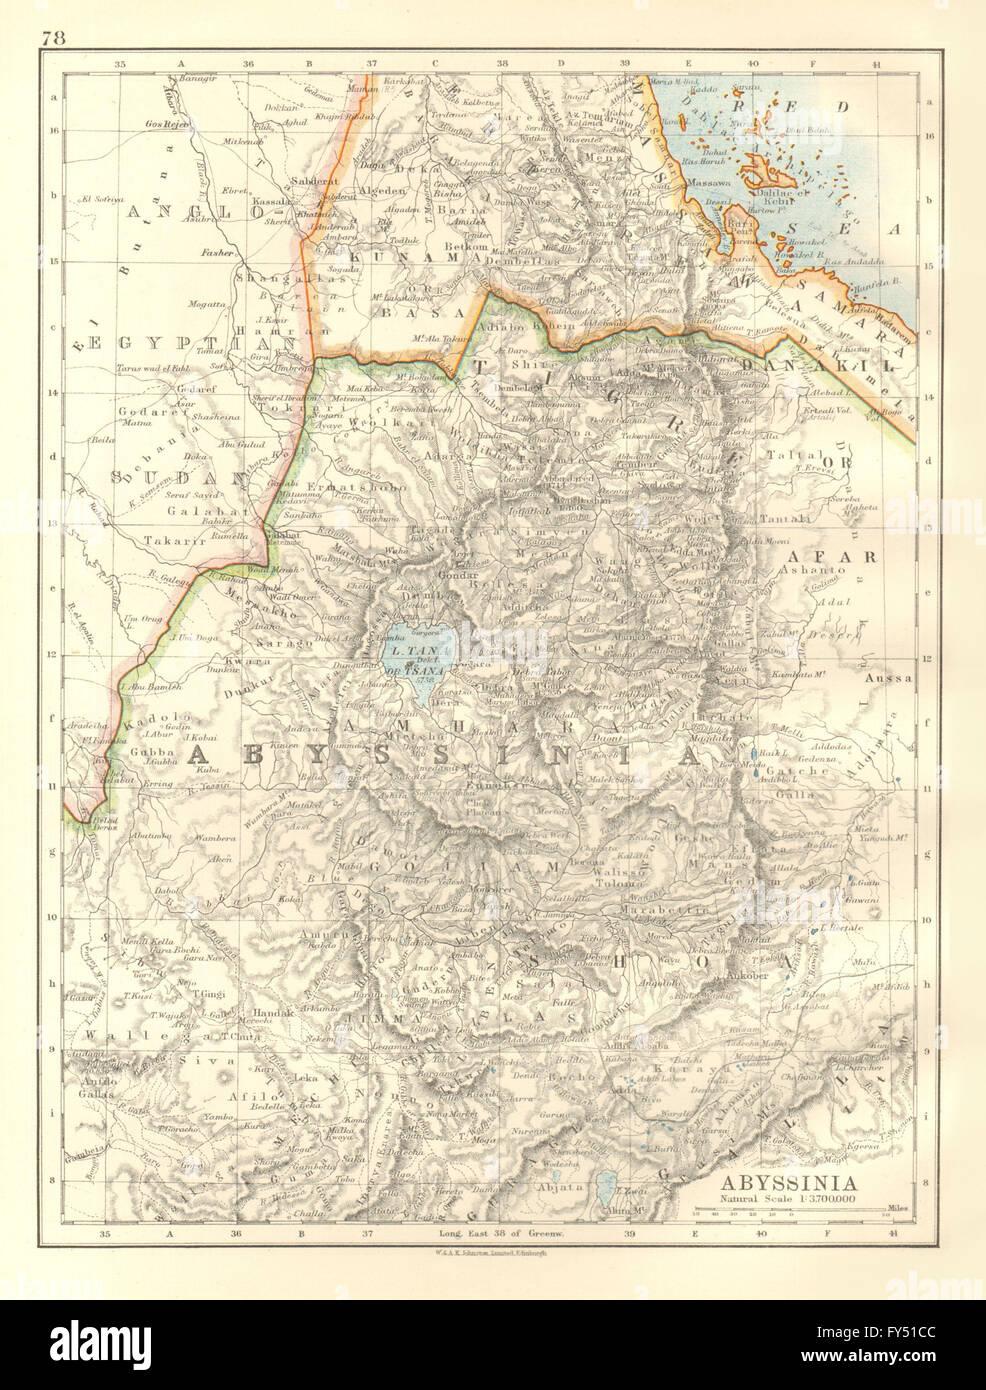 Abyssinia tigre amhara shoa gojjam ethiopia eritrea johnston abyssinia tigre amhara shoa gojjam ethiopia eritrea johnston 1920 old map gumiabroncs Image collections